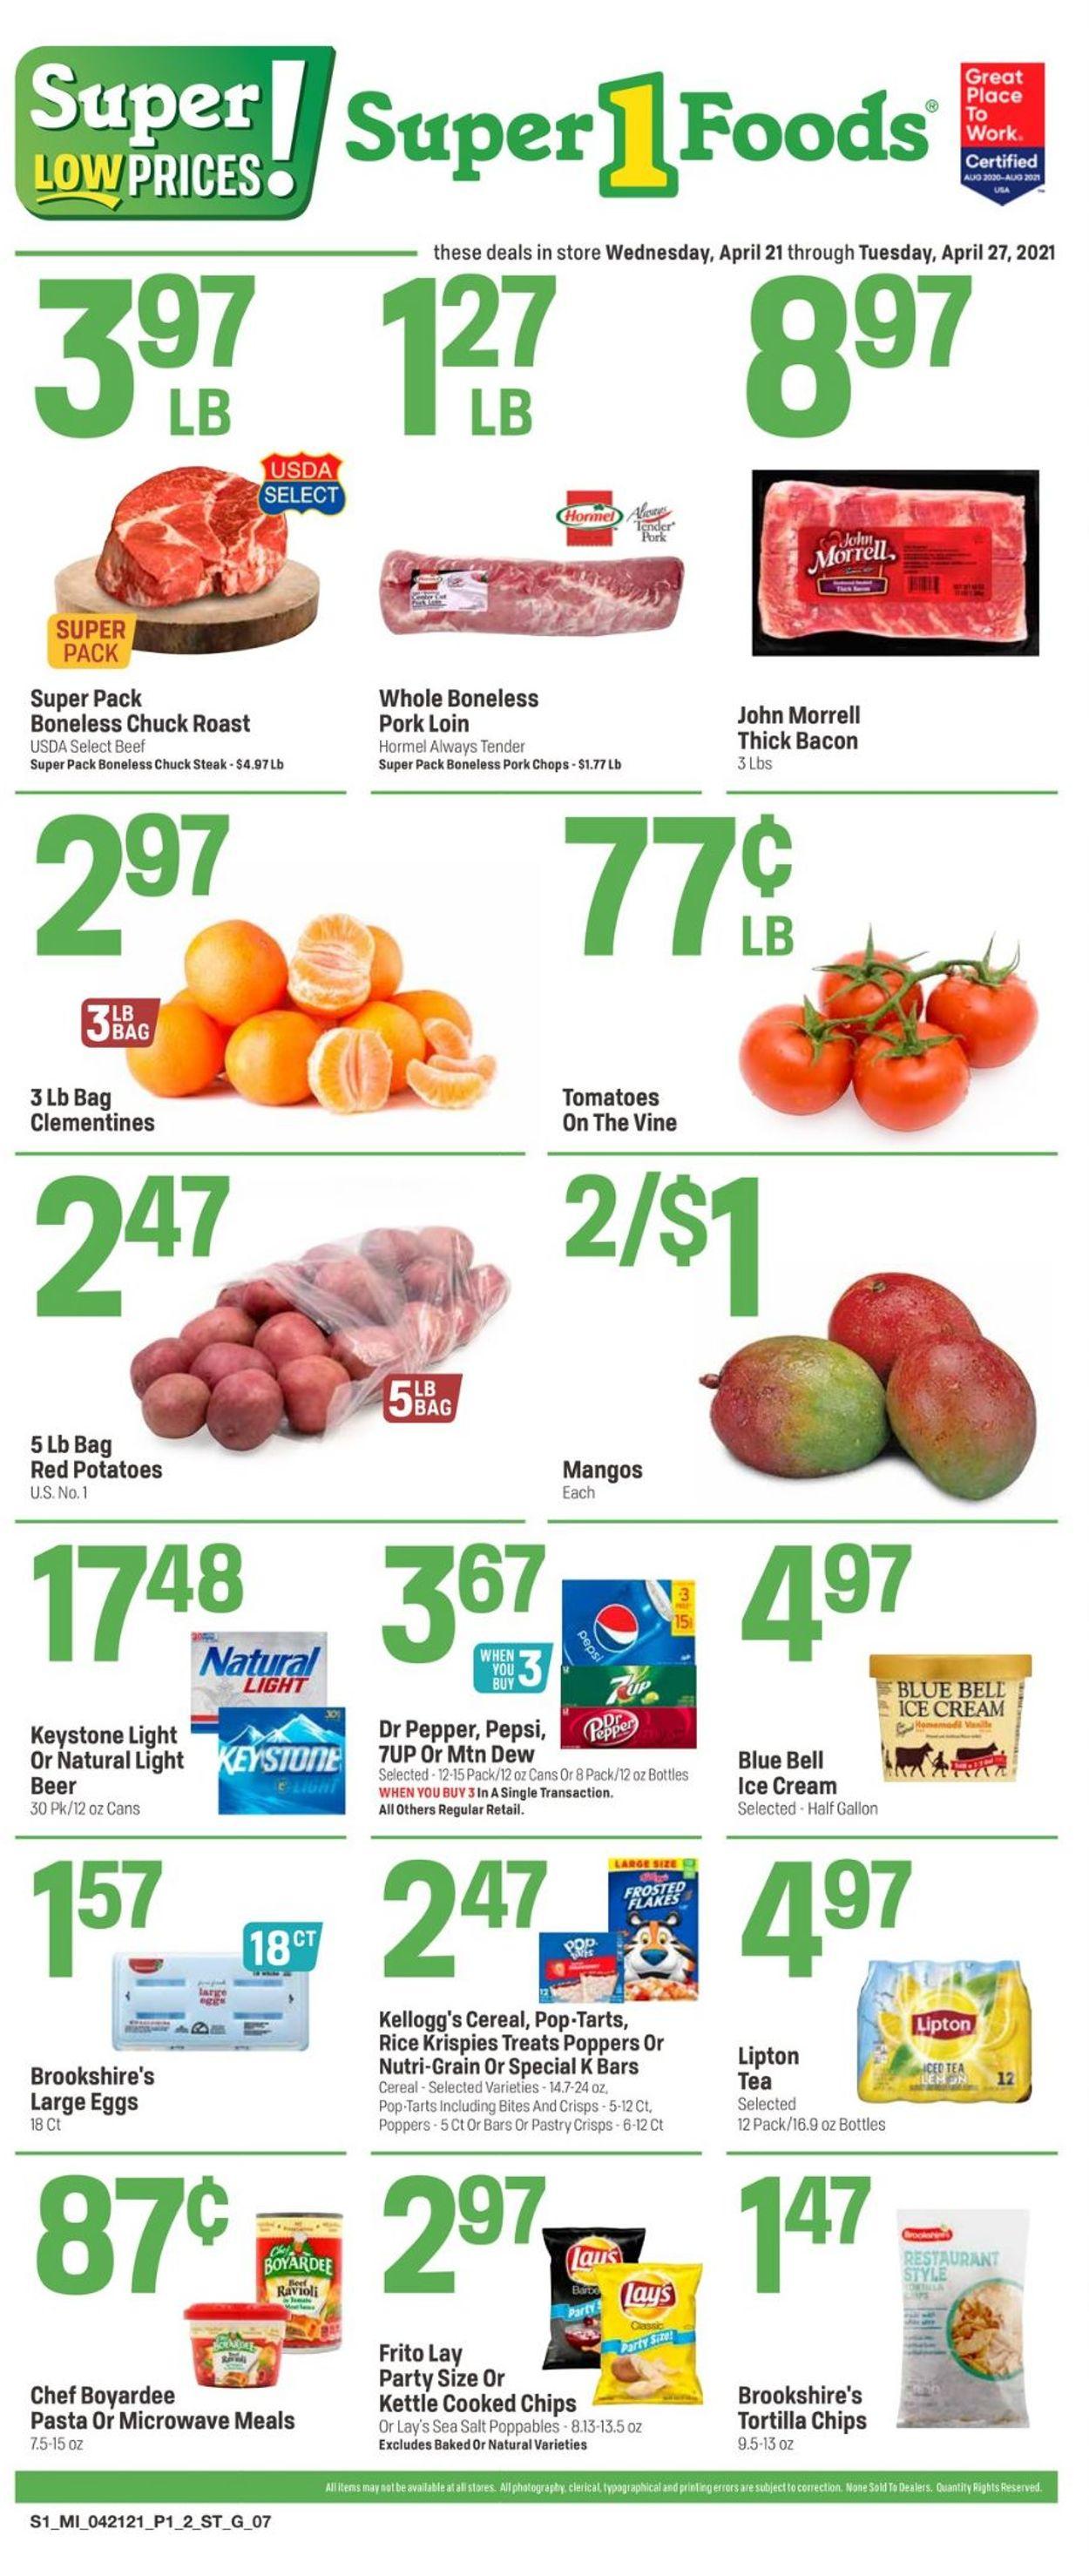 Super 1 Foods Weekly Ad Circular - valid 04/21-04/27/2021